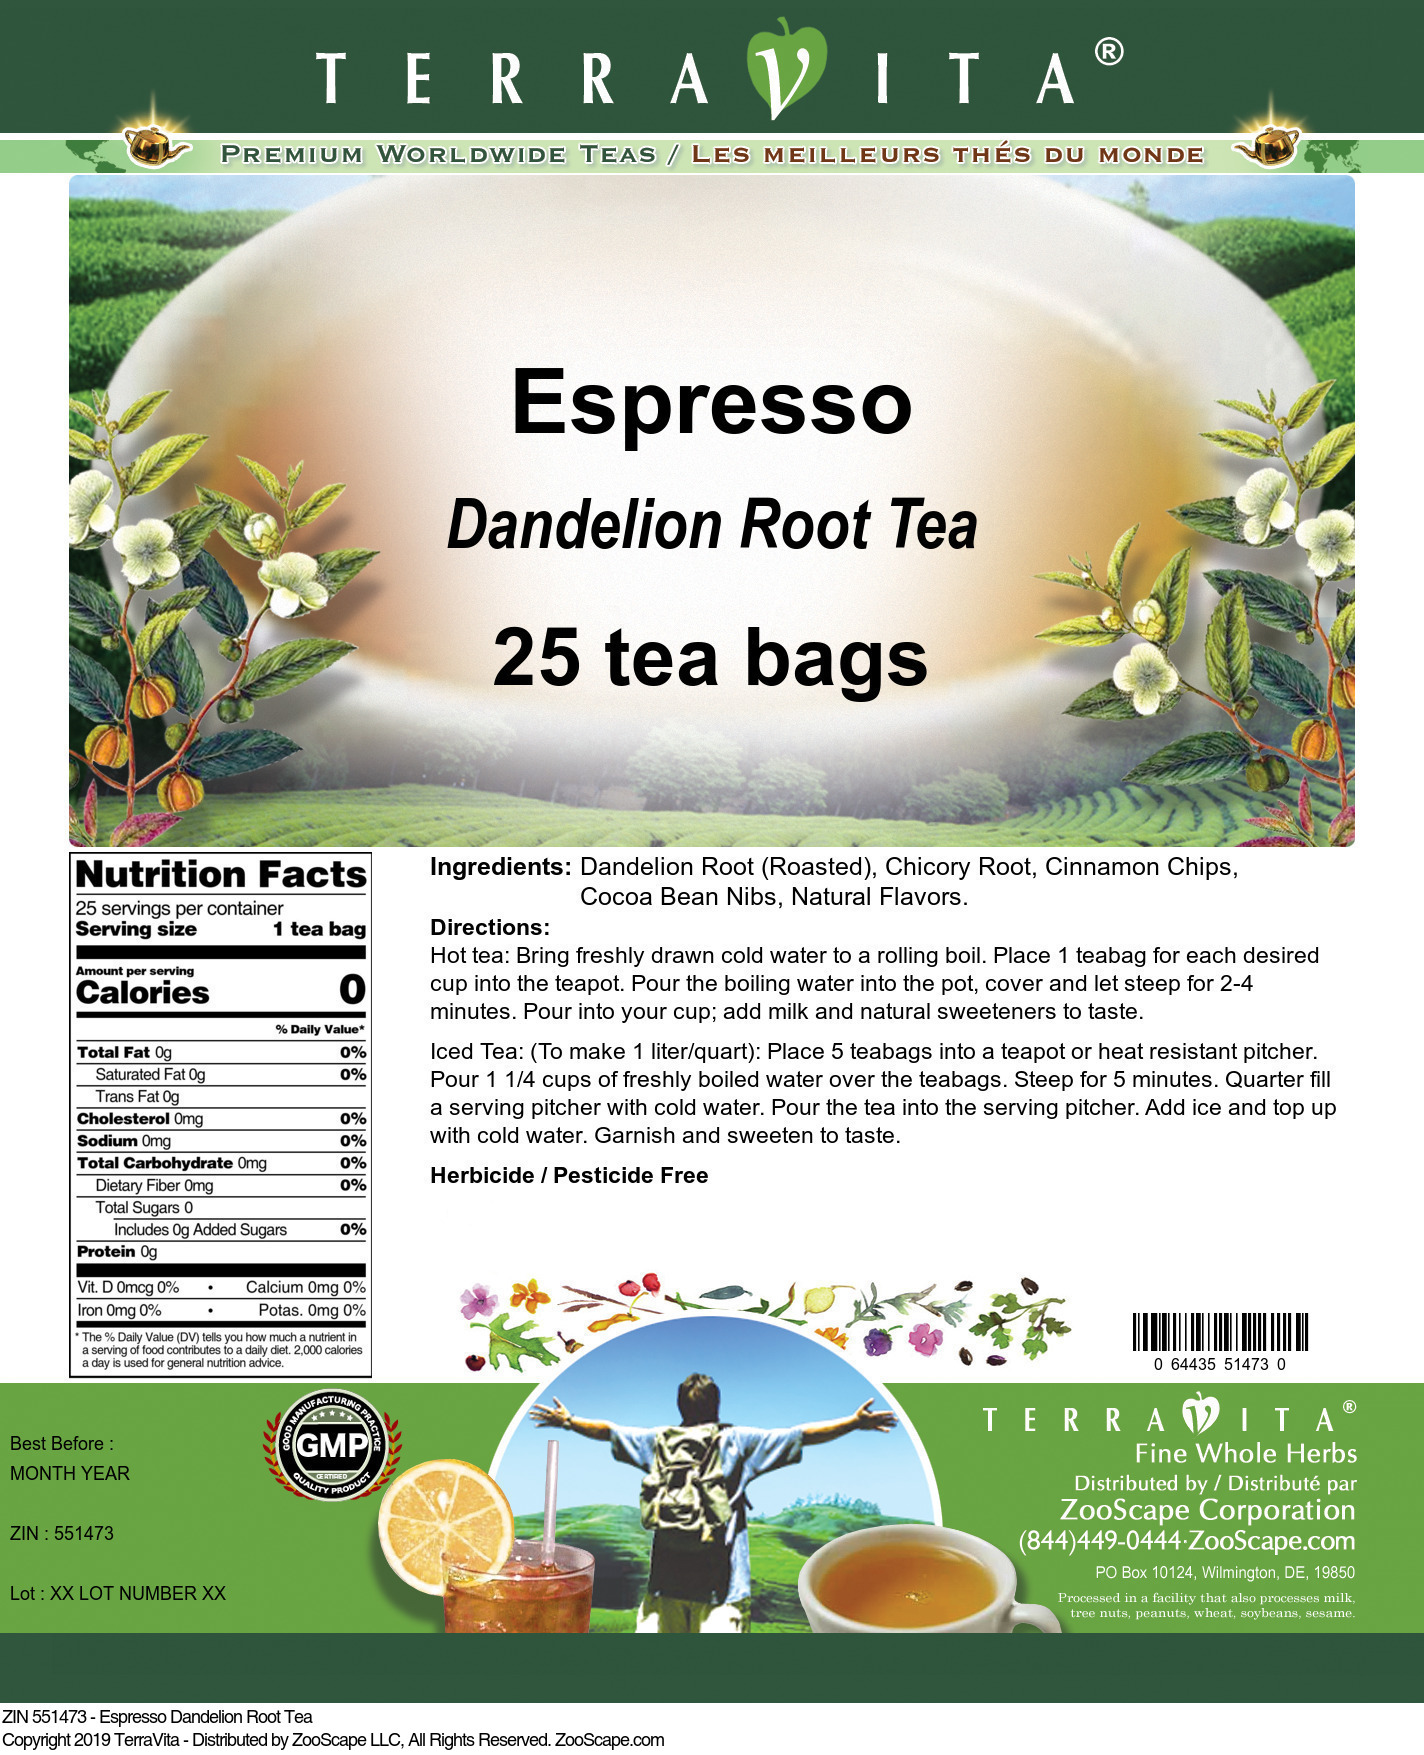 Espresso Dandelion Root Tea